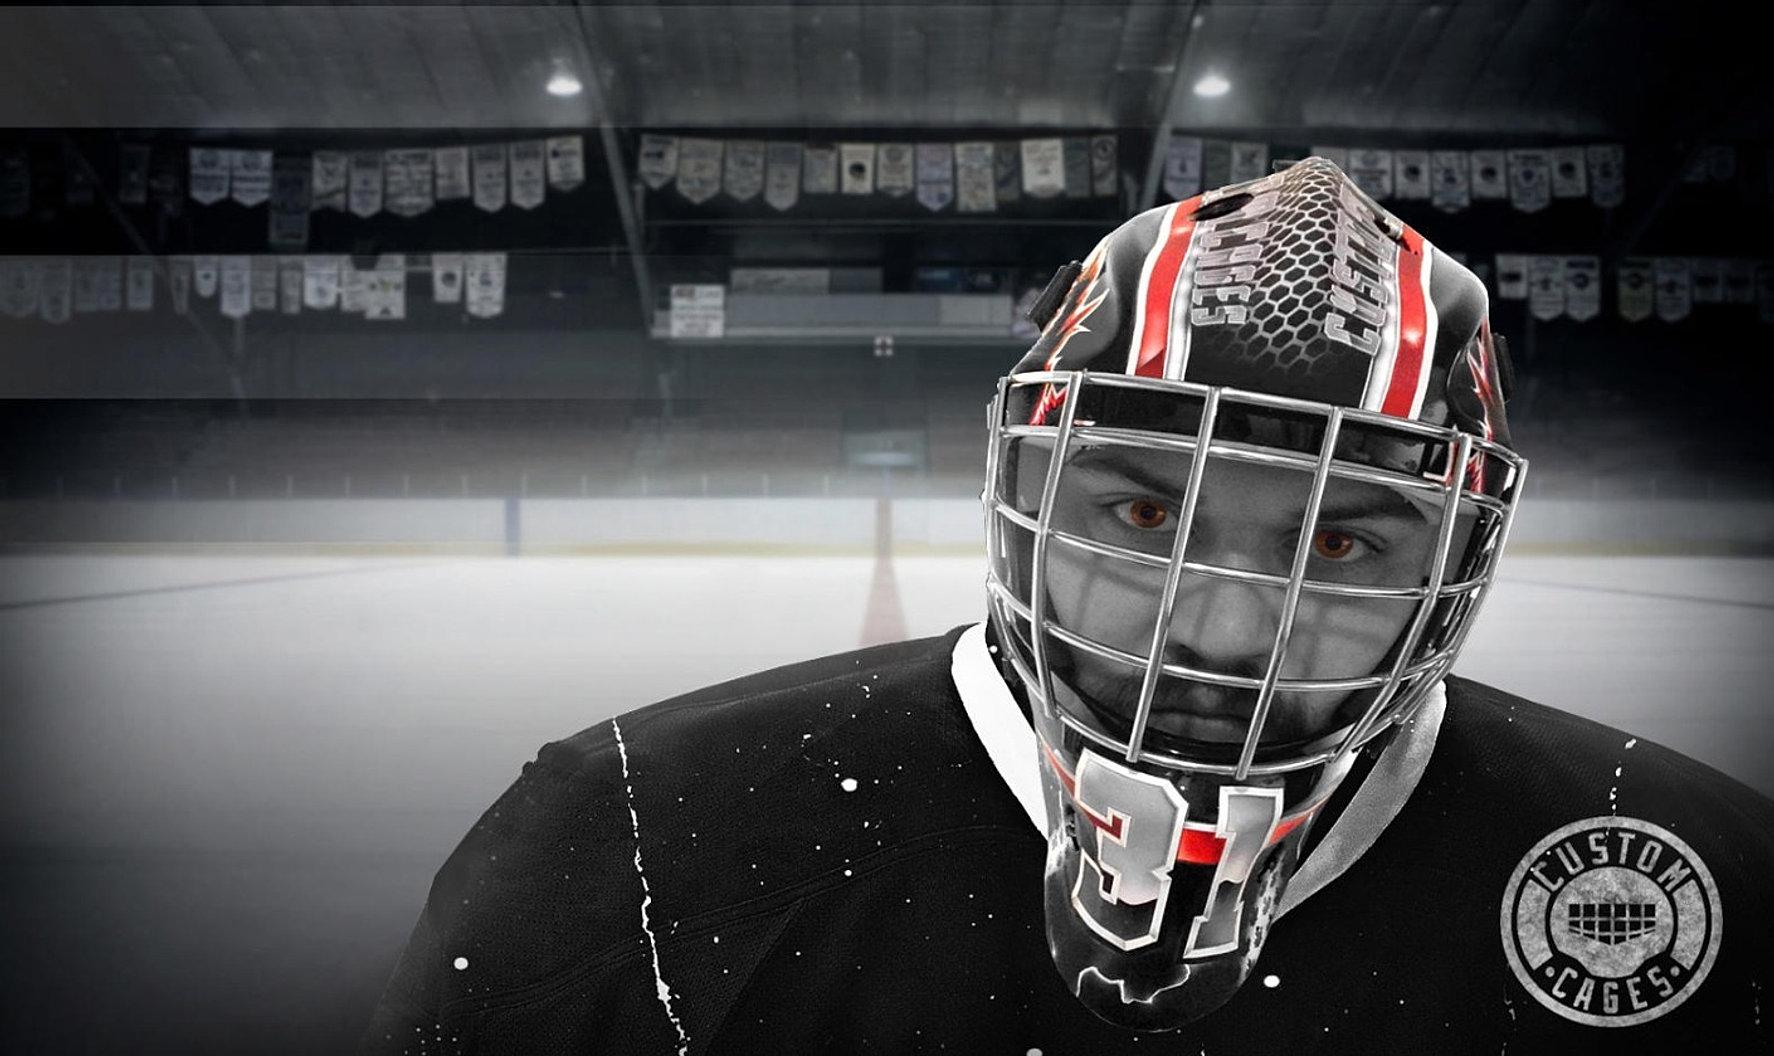 bauer goalie mask template - custom goalie mask design and vinyl decal kits